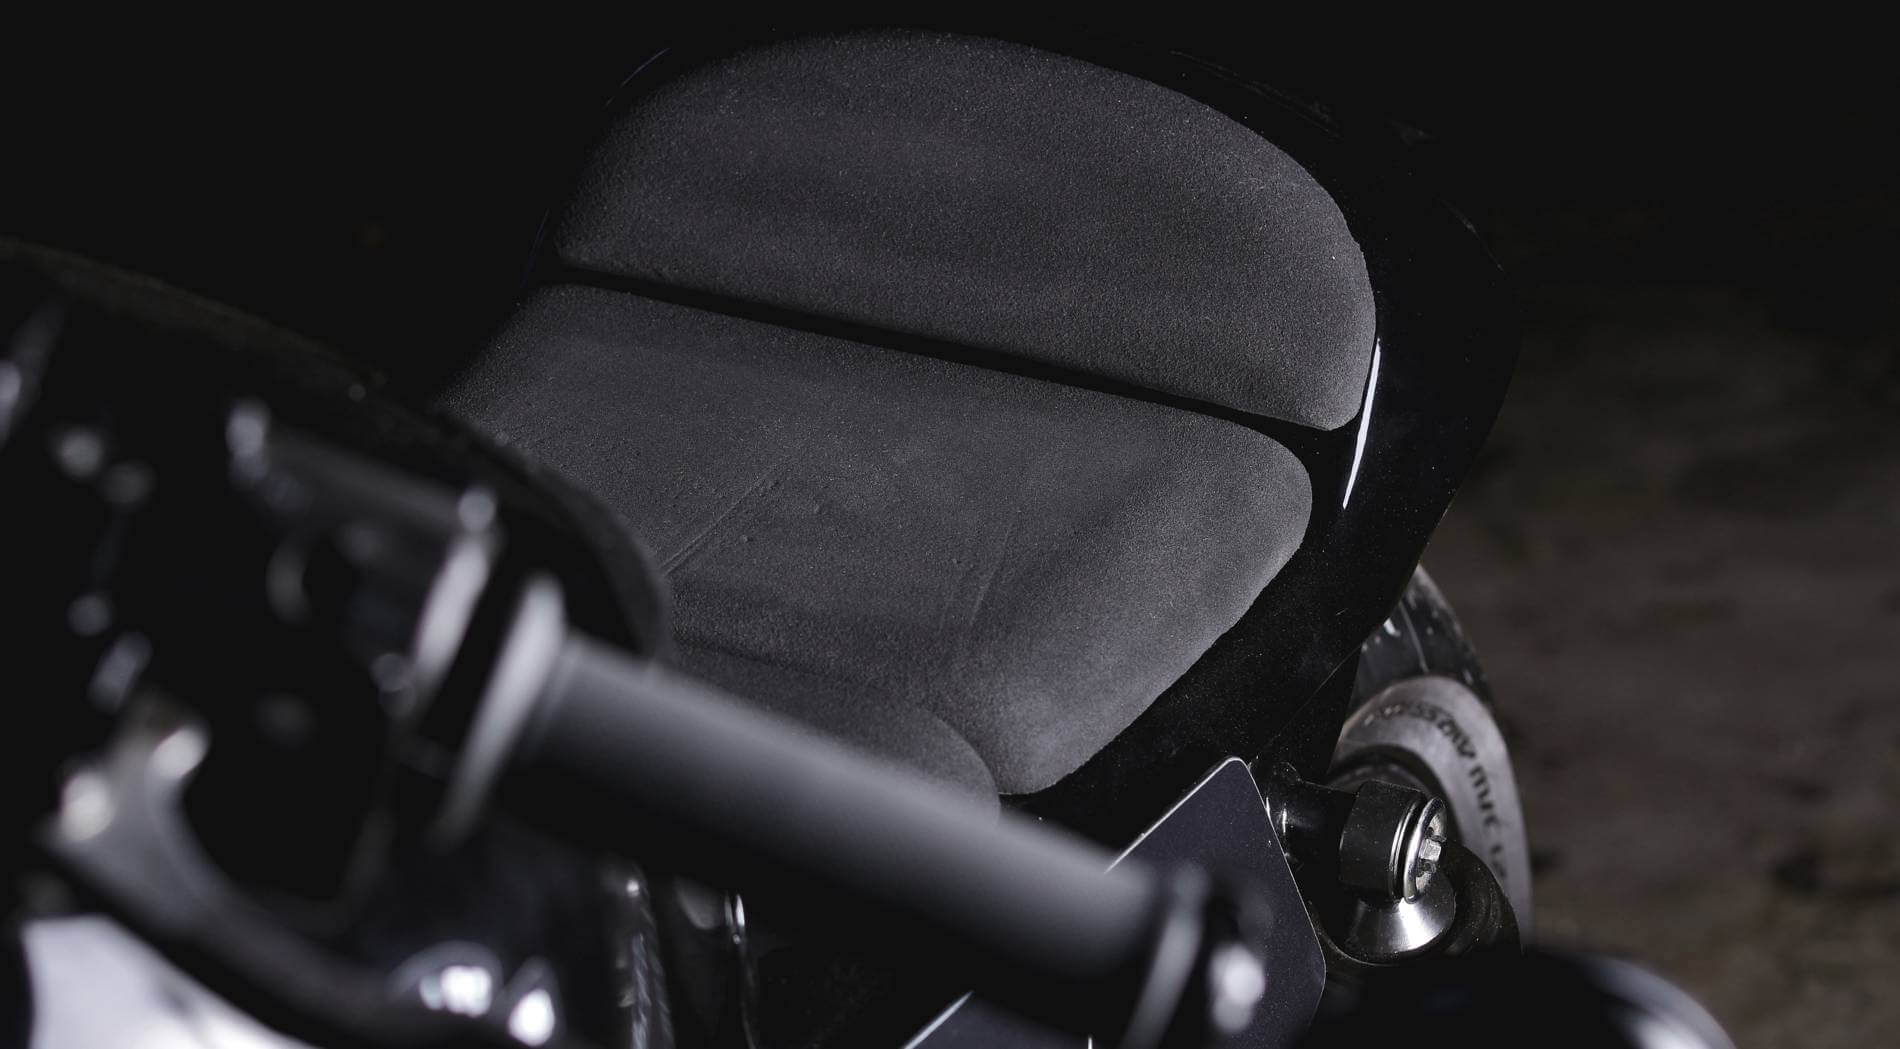 motorradsitzbank-aus-zellkautschuk-moosgummi-bauen